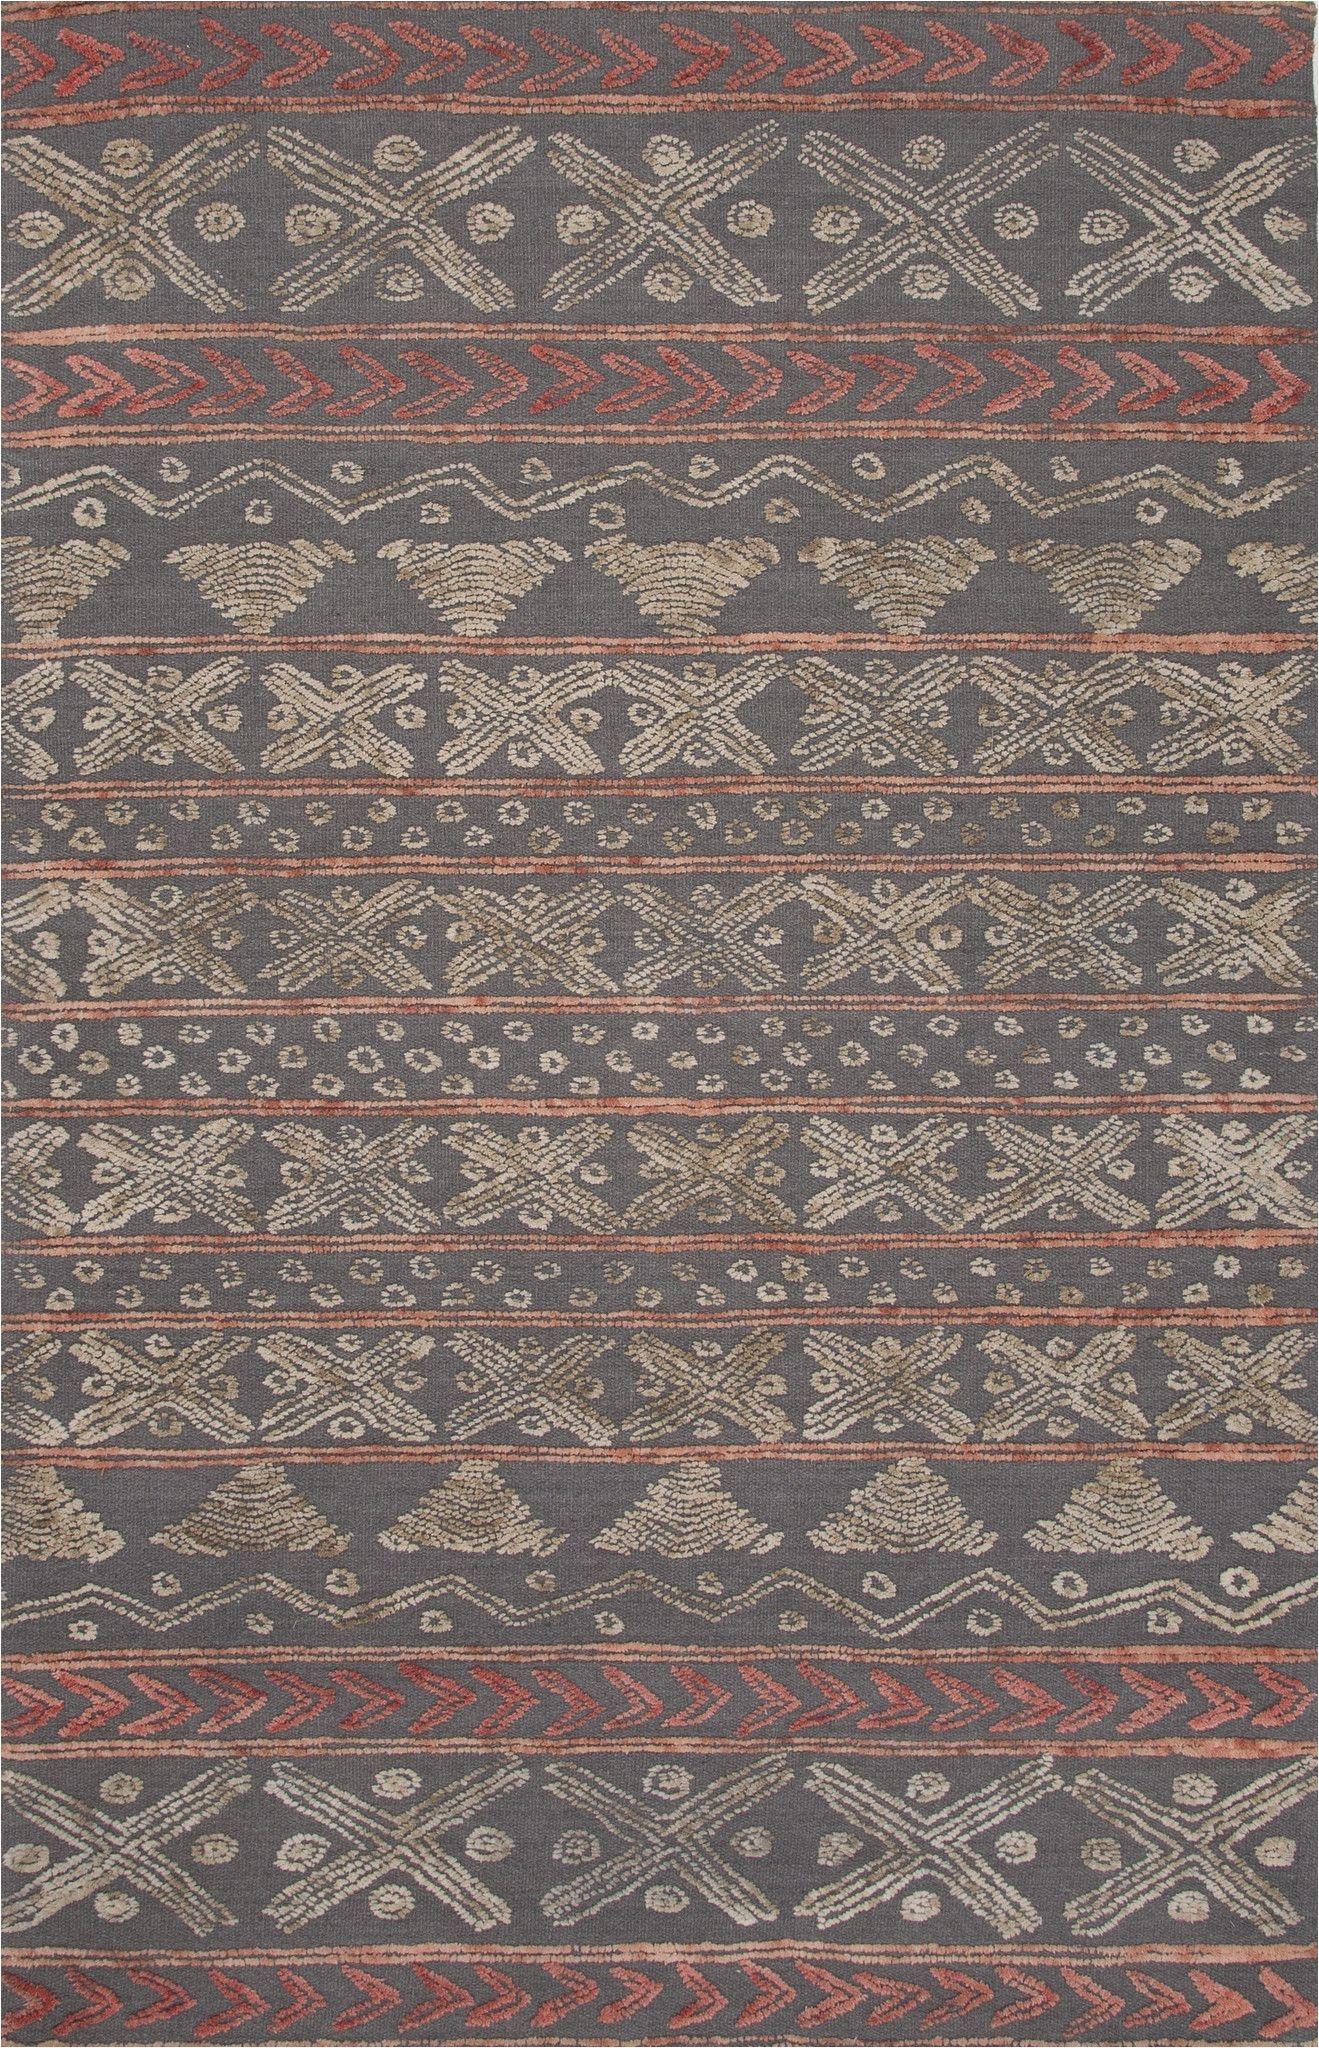 jaipur rugs modern tribal pattern gray wool area rug sti03 rectangle